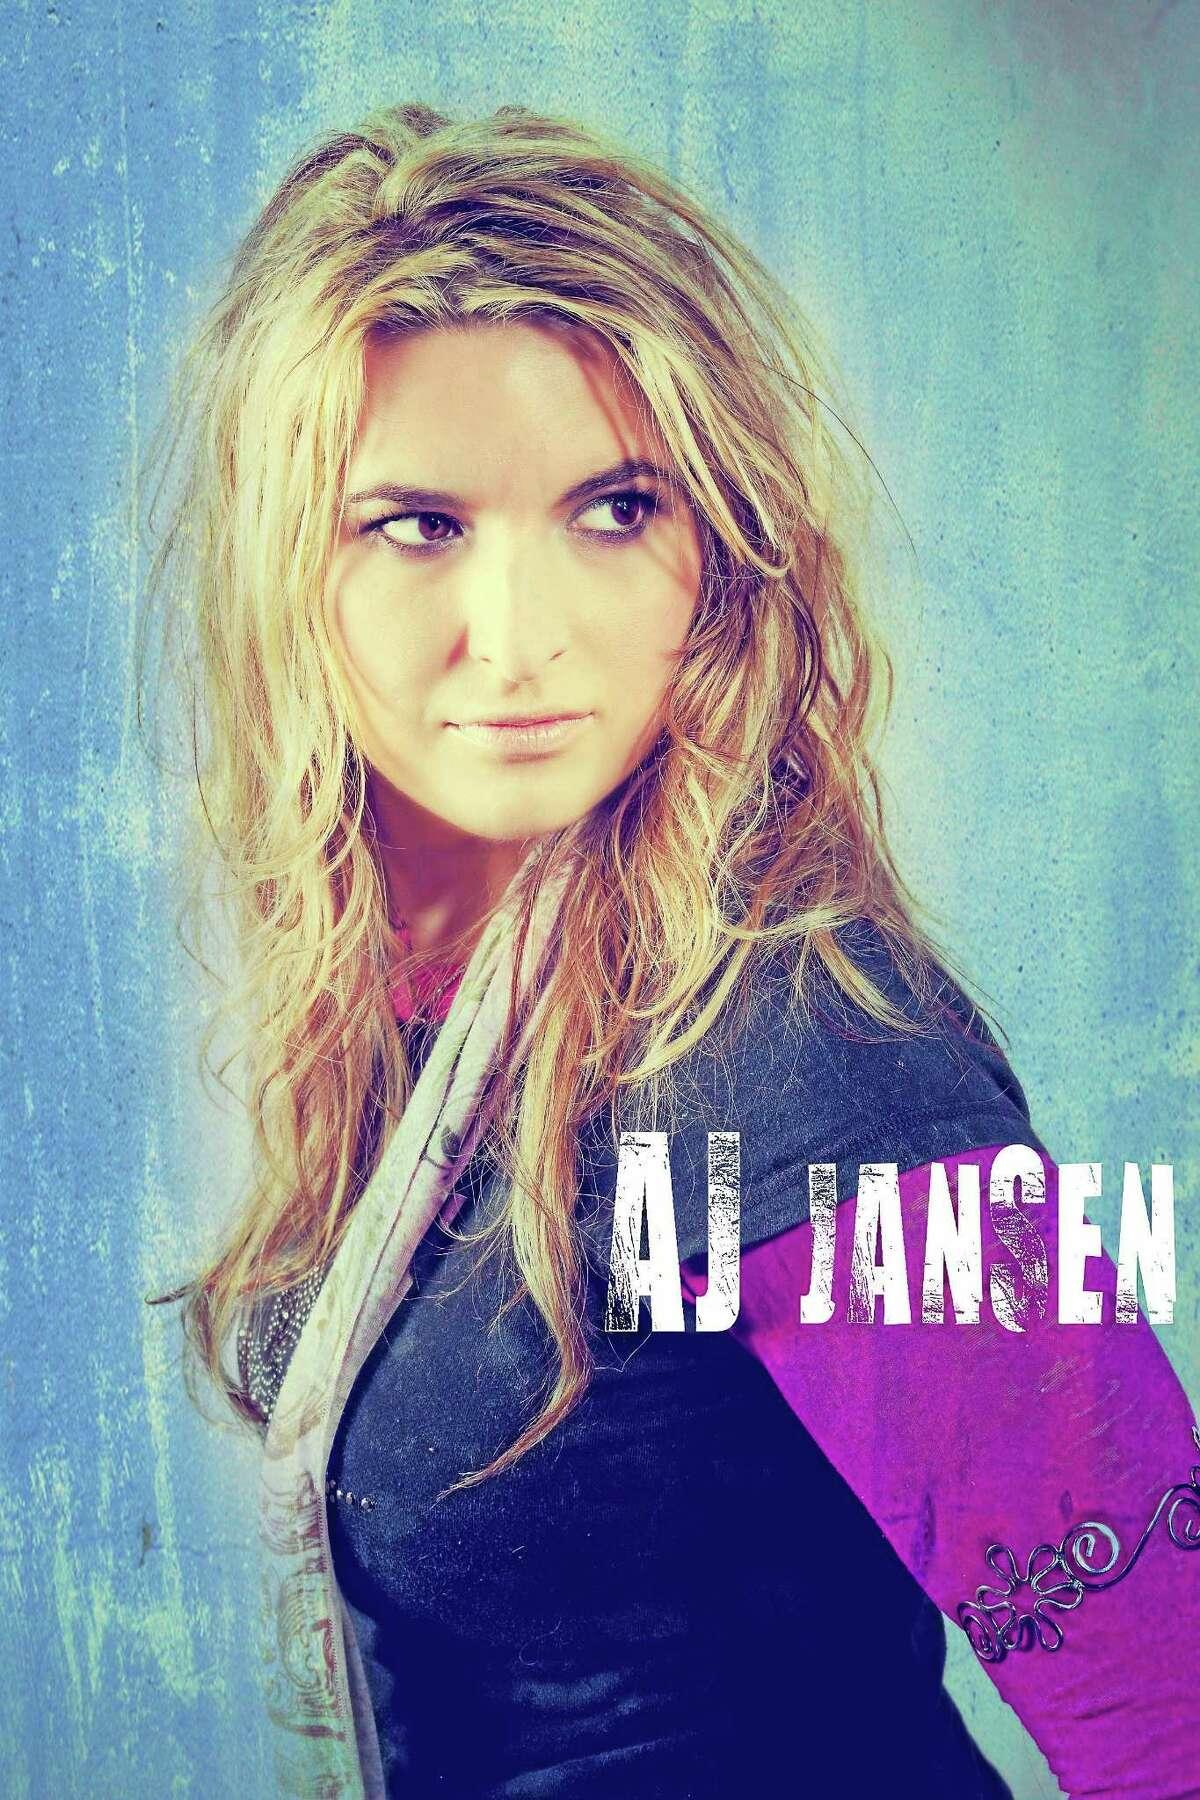 Submitted photo - AJ Jansen Singer AJ Jansen is part of Coe Park Unplugged on Sept. 20 in Torrington.